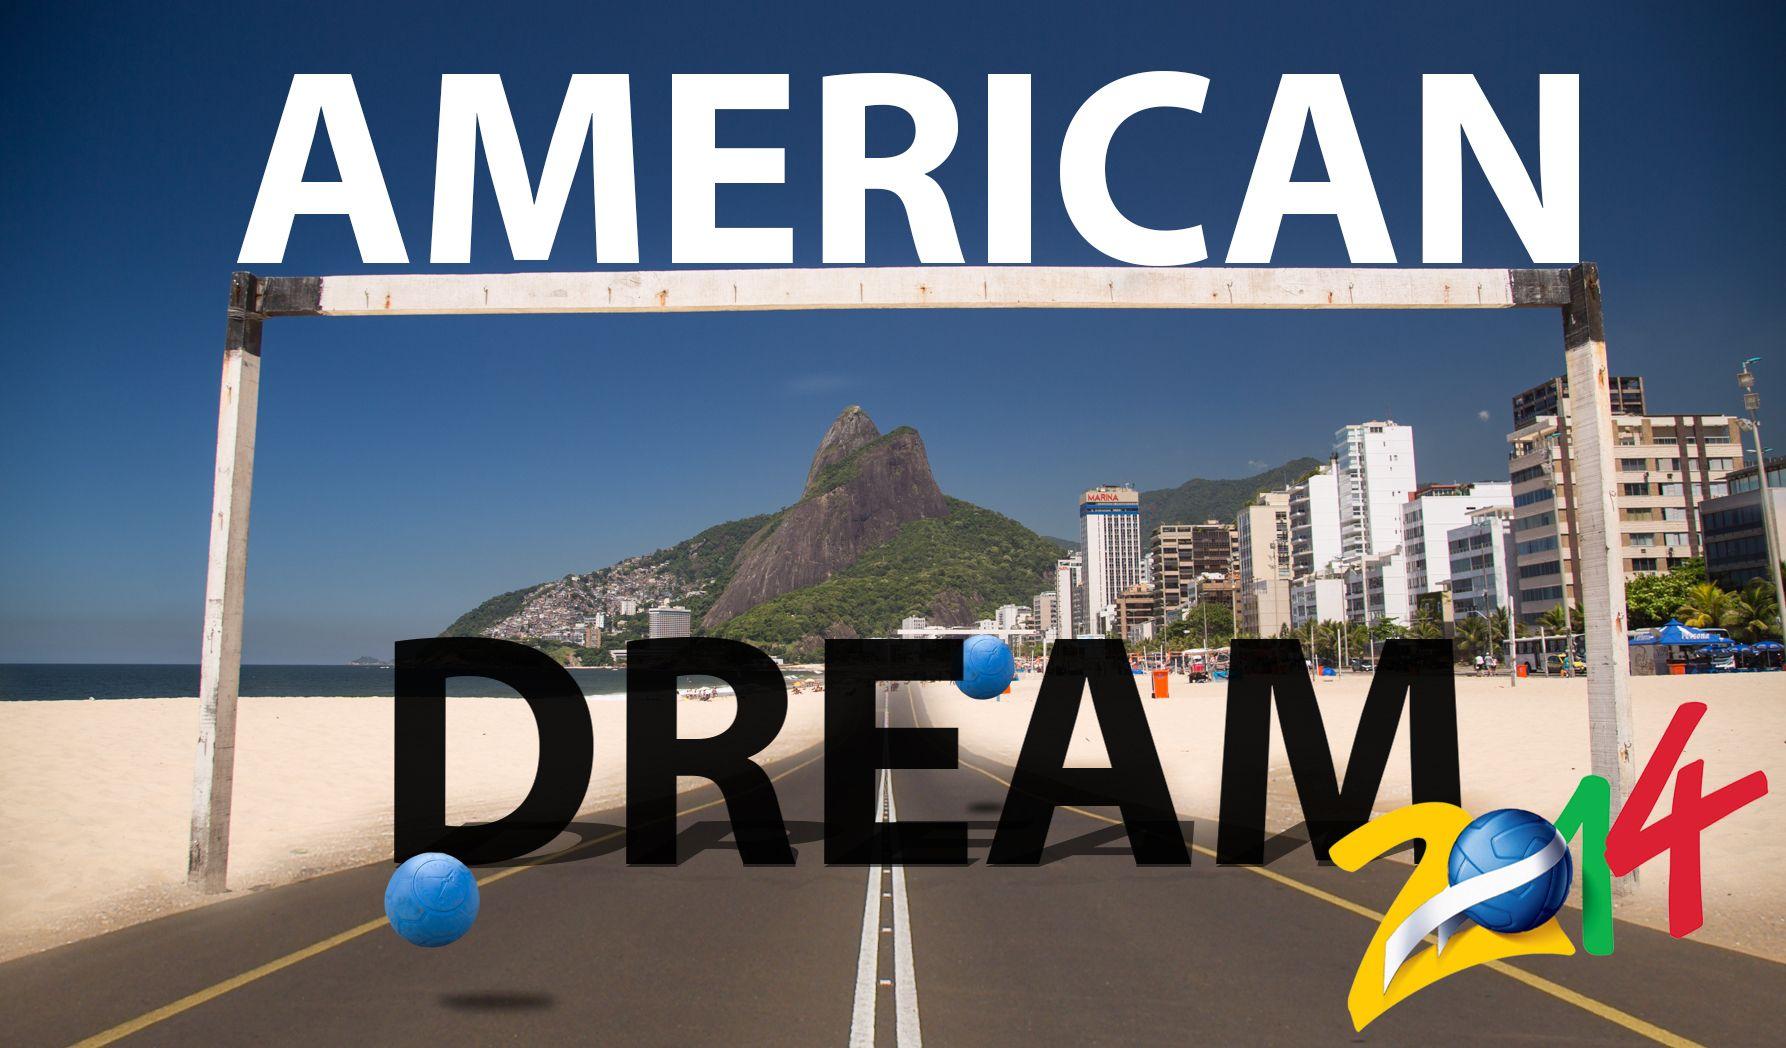 1r1__americandream_road_ball_2014.jpg